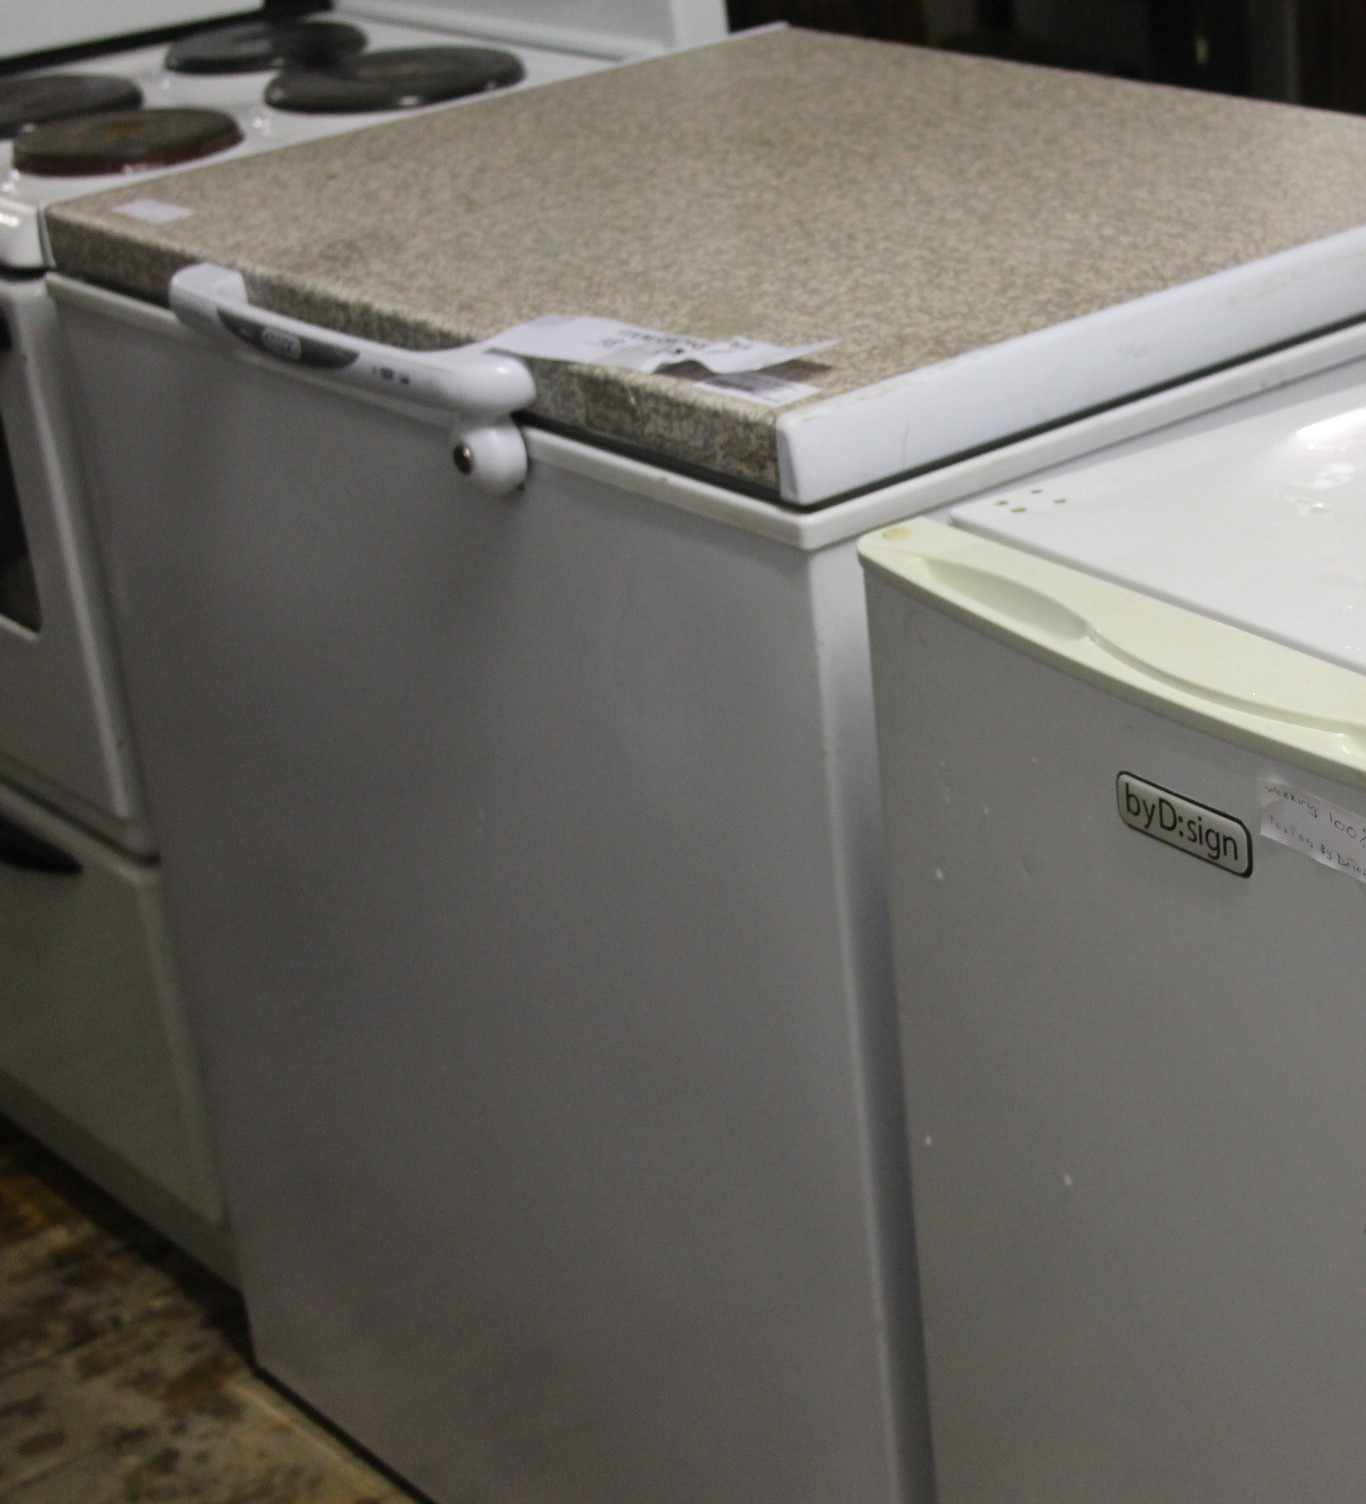 Defy freezer S028563b #Rosettenvillepawnshop